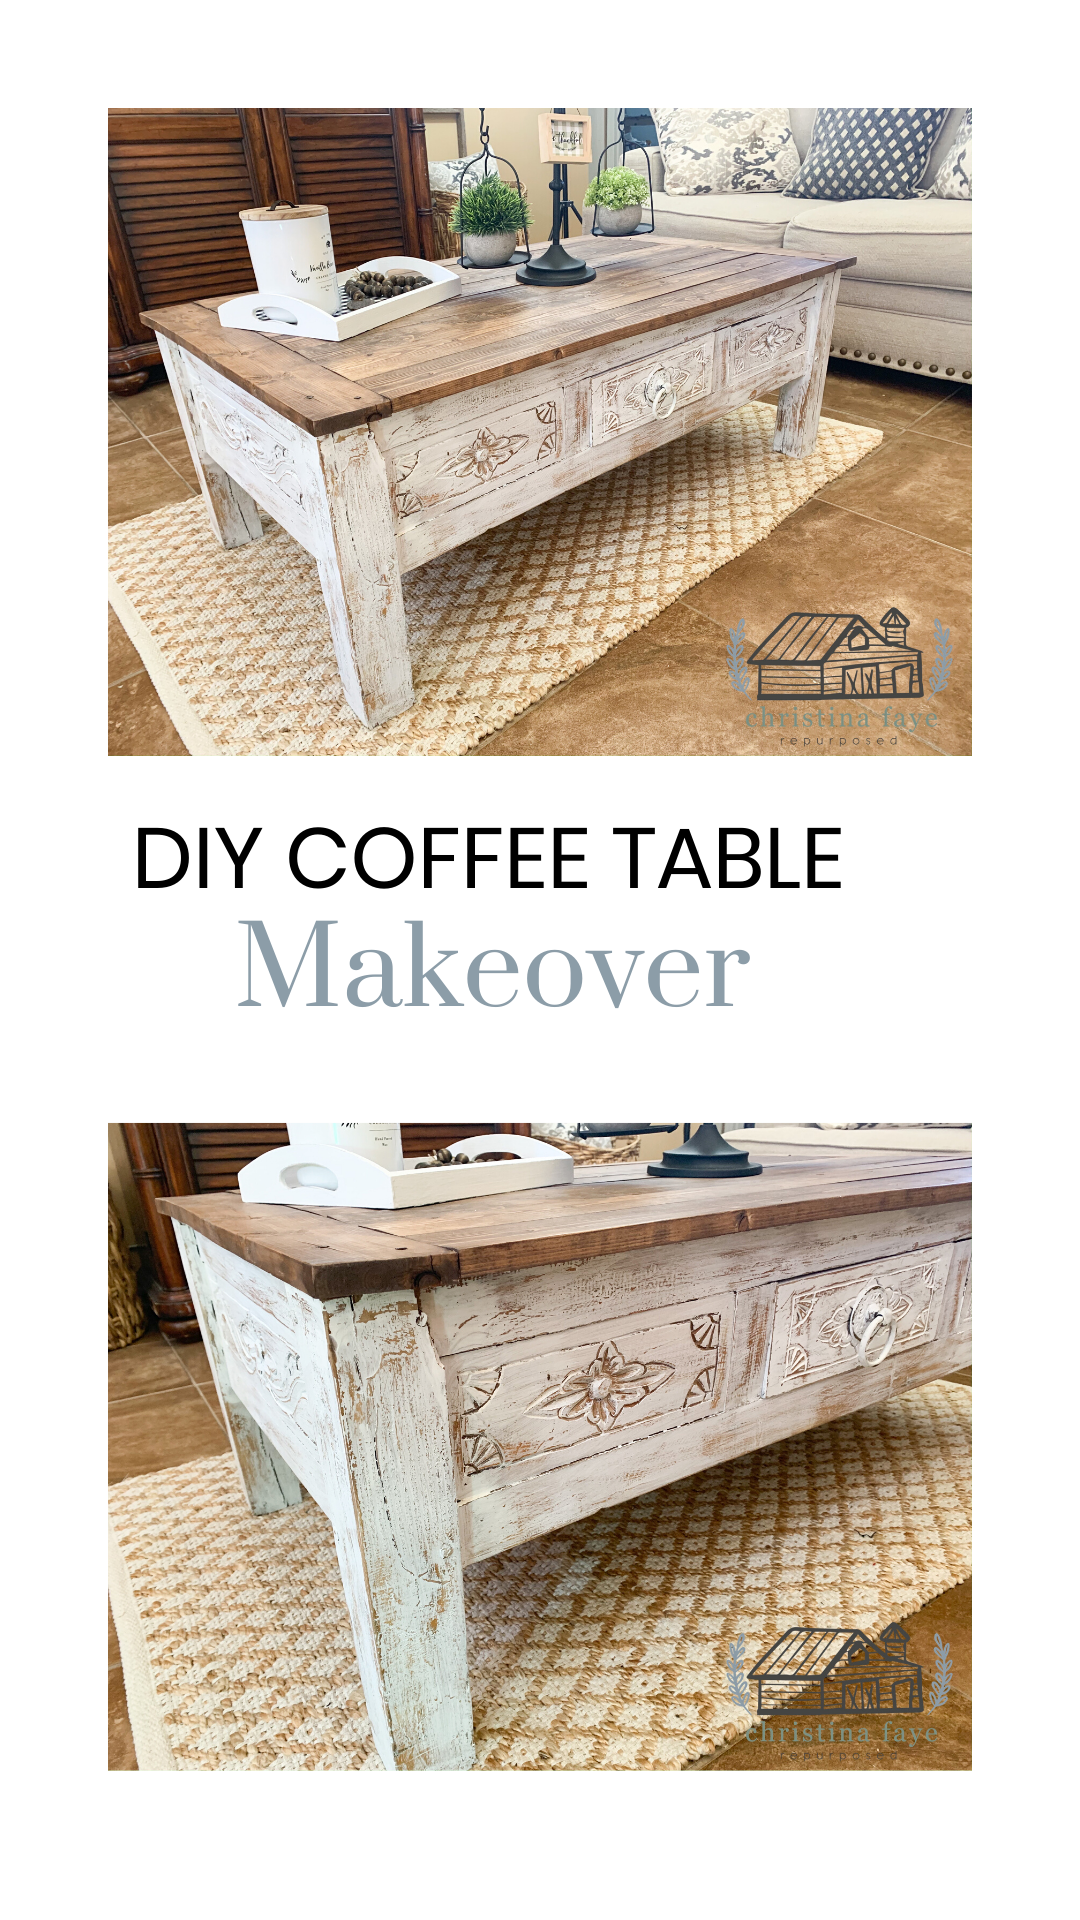 Diy Coffee Table Makeover Diy Coffee Table Coffee Table Makeover Coffee Table [ 1920 x 1080 Pixel ]